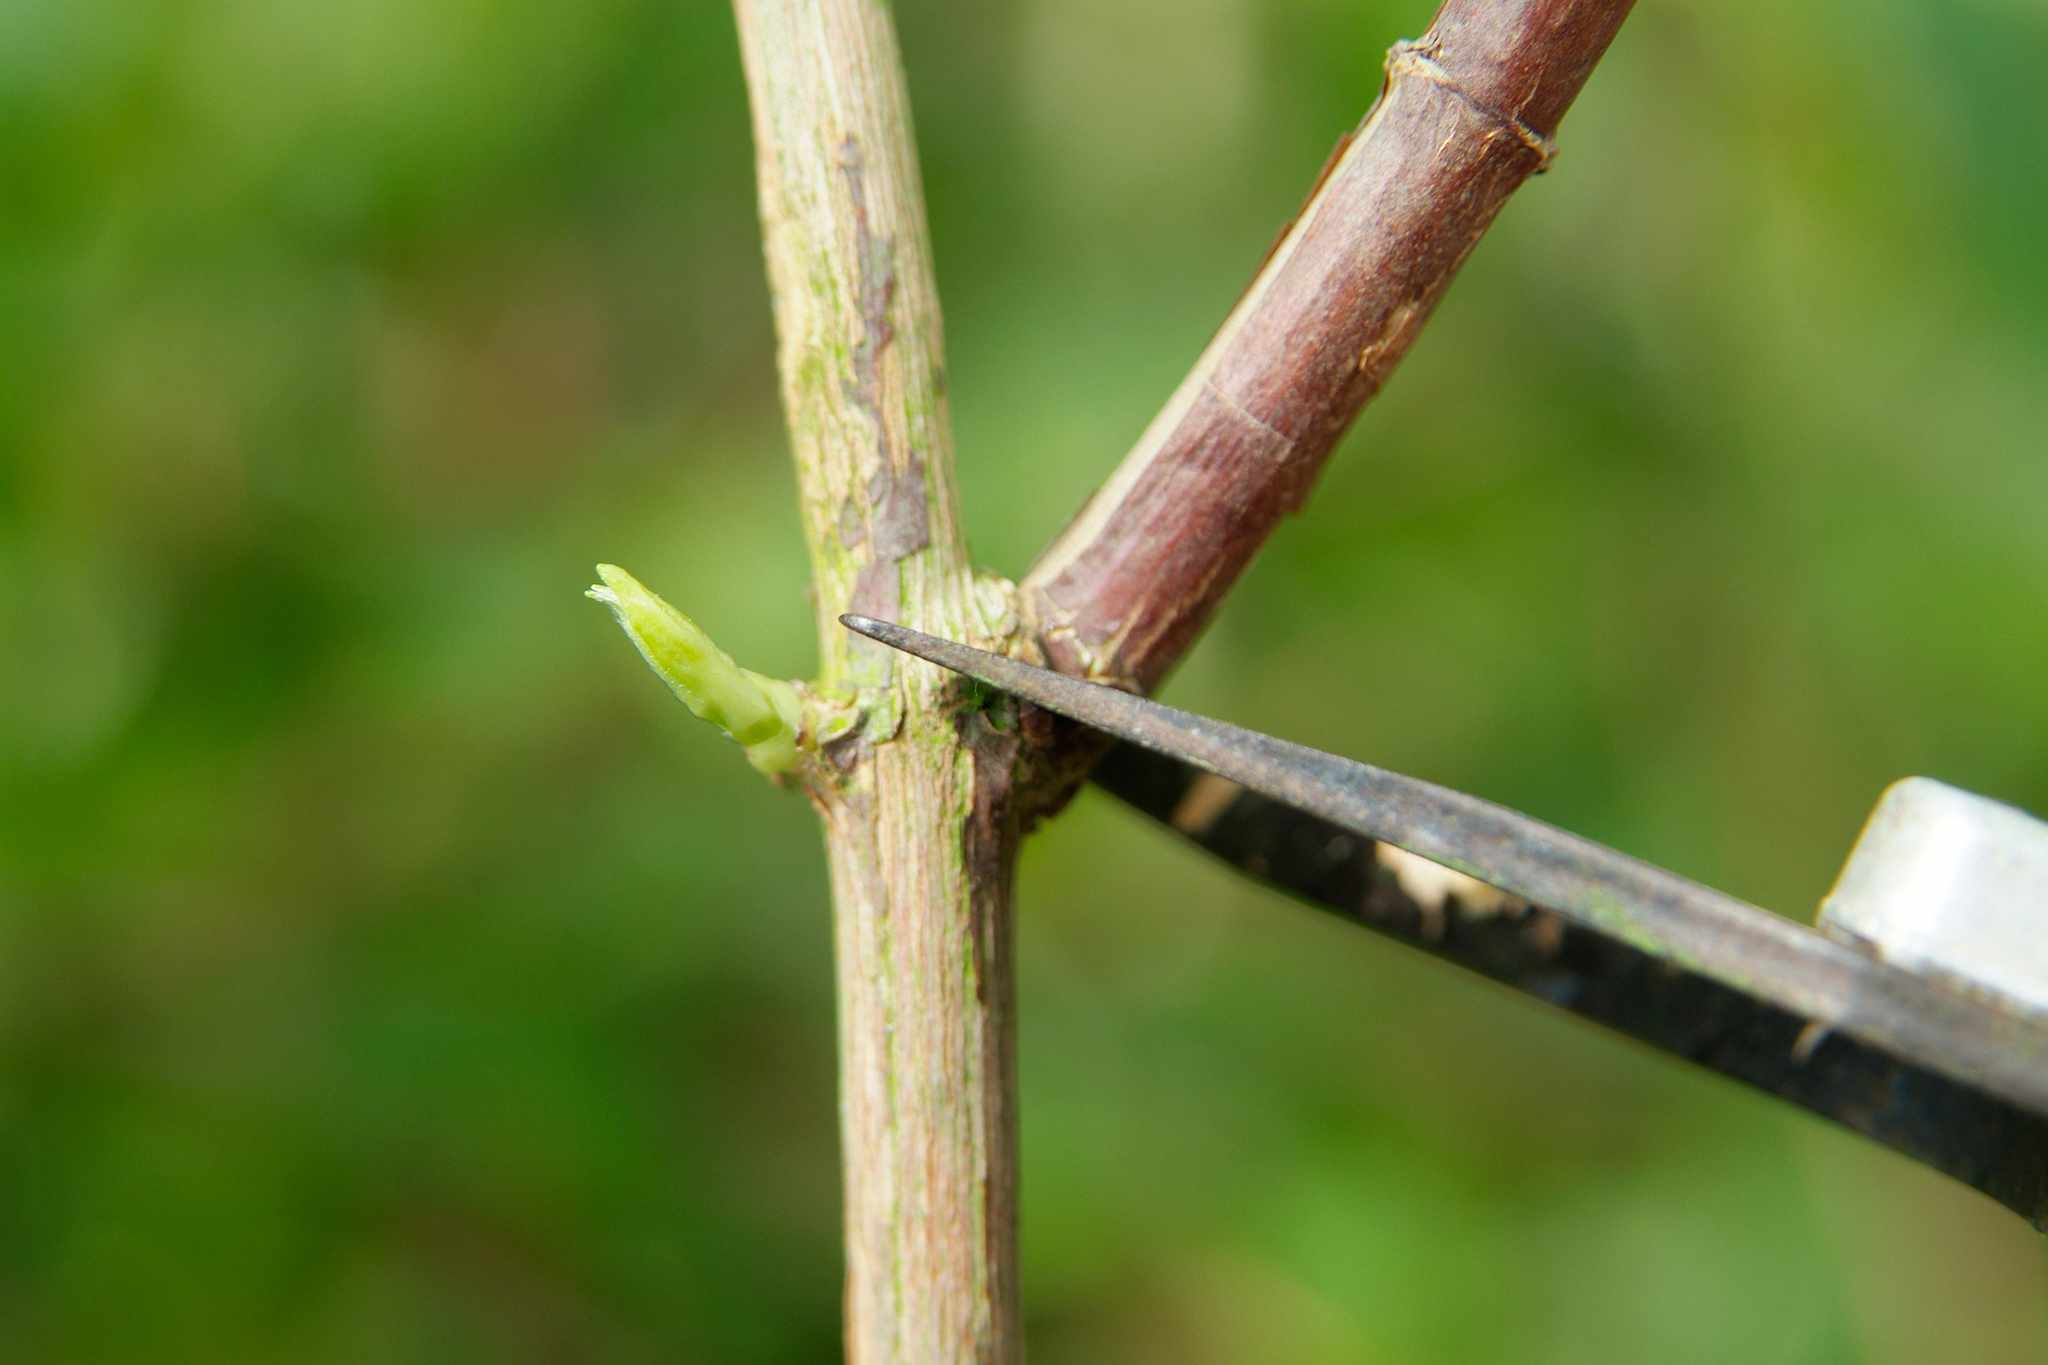 How to prune spring-flowering plants